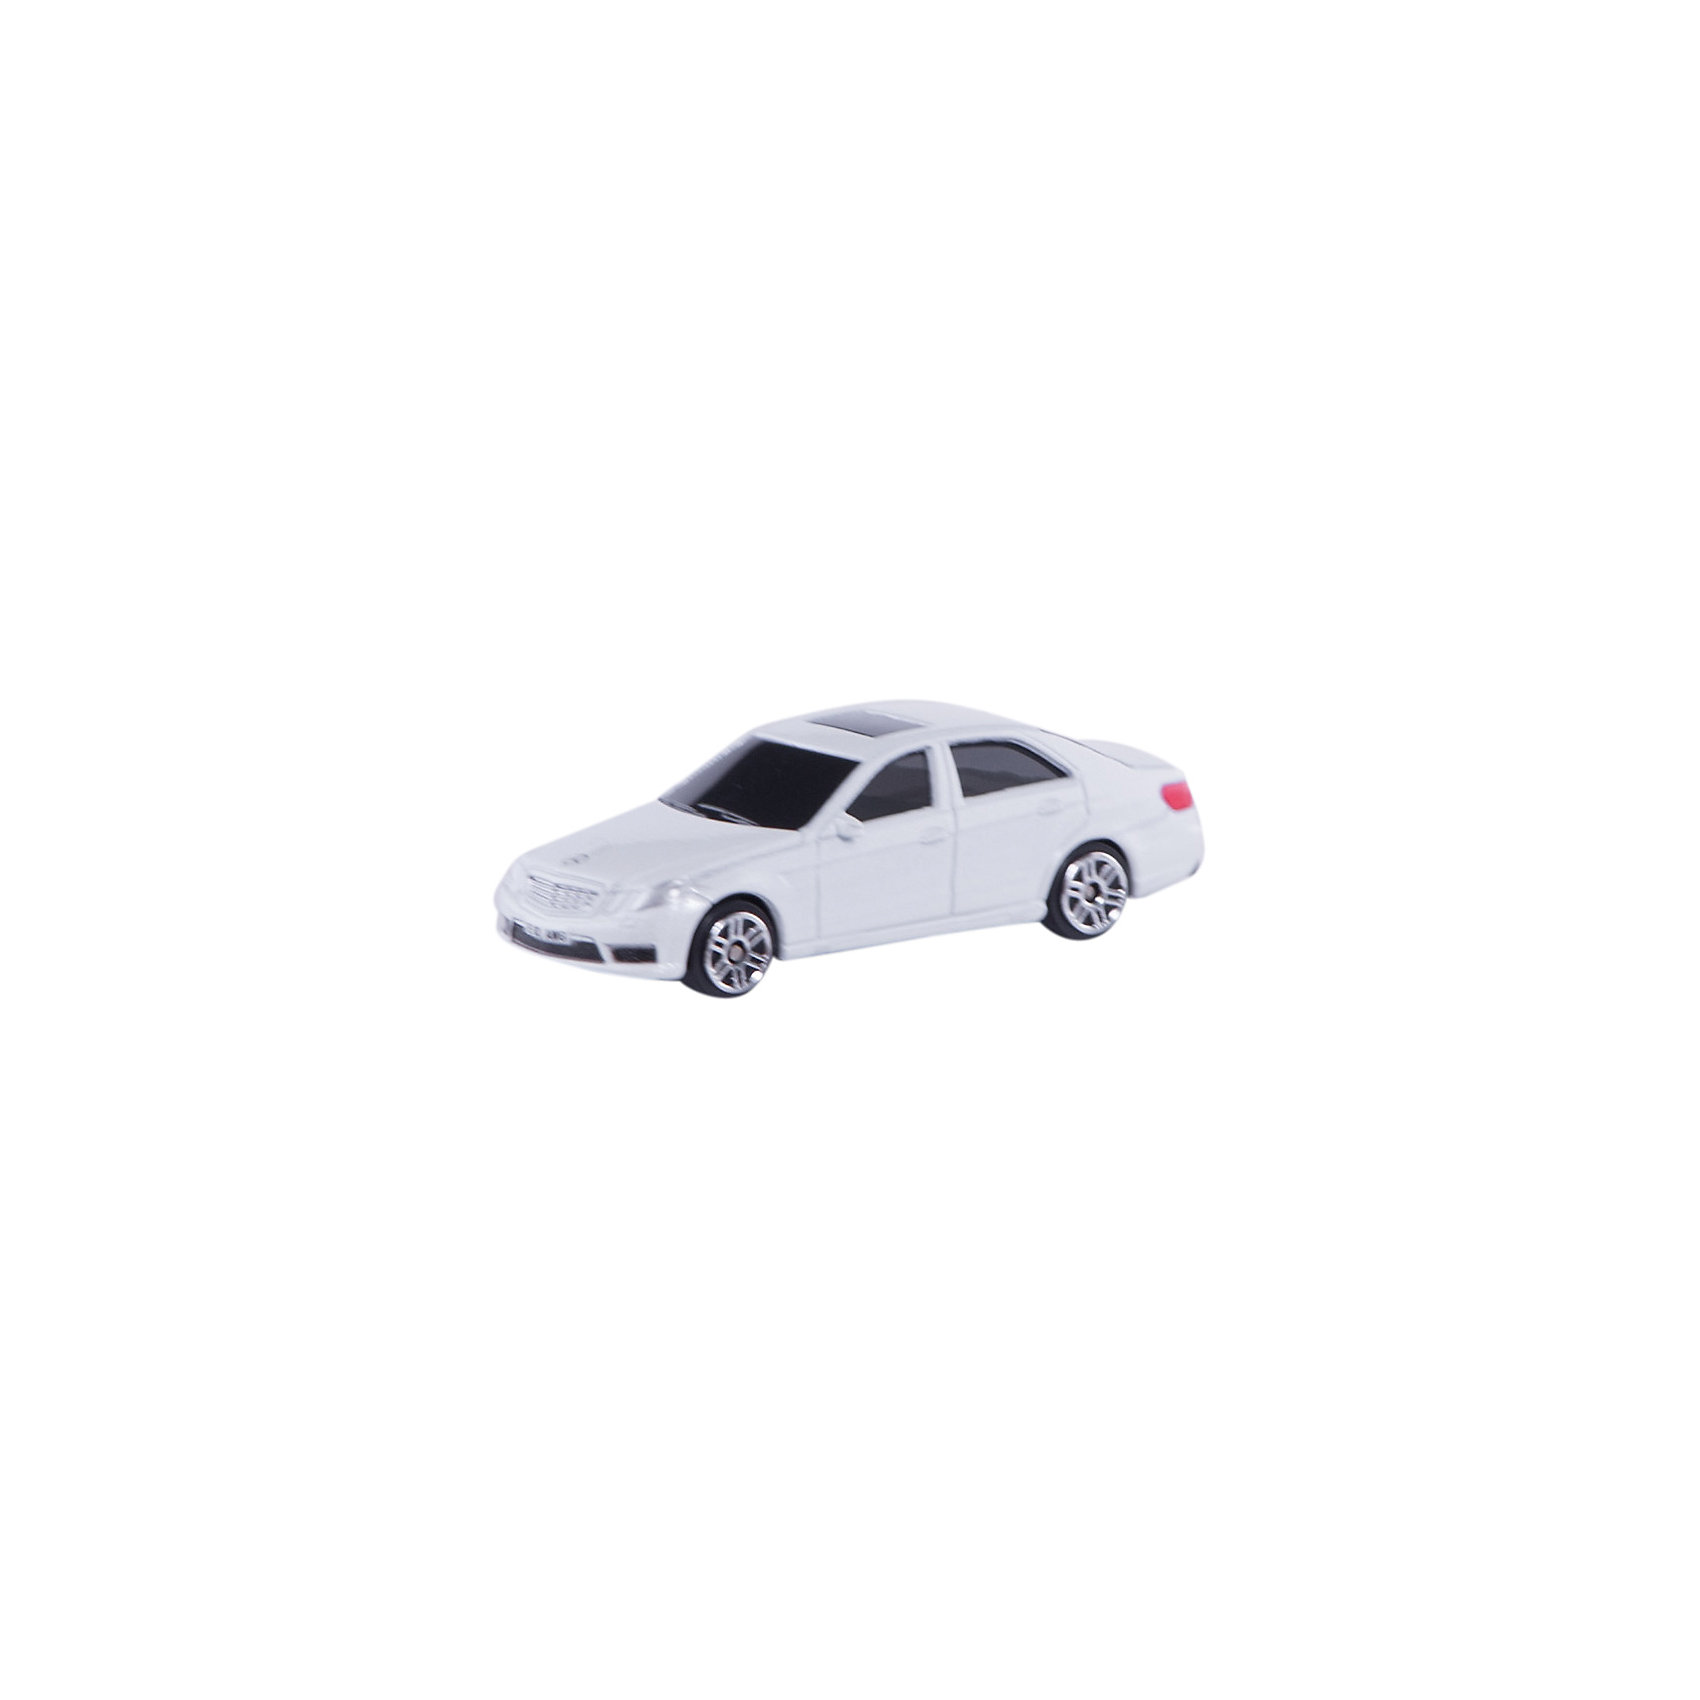 Машинка Mercedes-Benz E63 AMG Jeans 3, AutotimeМашинки<br><br><br>Ширина мм: 90<br>Глубина мм: 42<br>Высота мм: 40<br>Вес г: 14<br>Возраст от месяцев: 36<br>Возраст до месяцев: 2147483647<br>Пол: Мужской<br>Возраст: Детский<br>SKU: 5584067